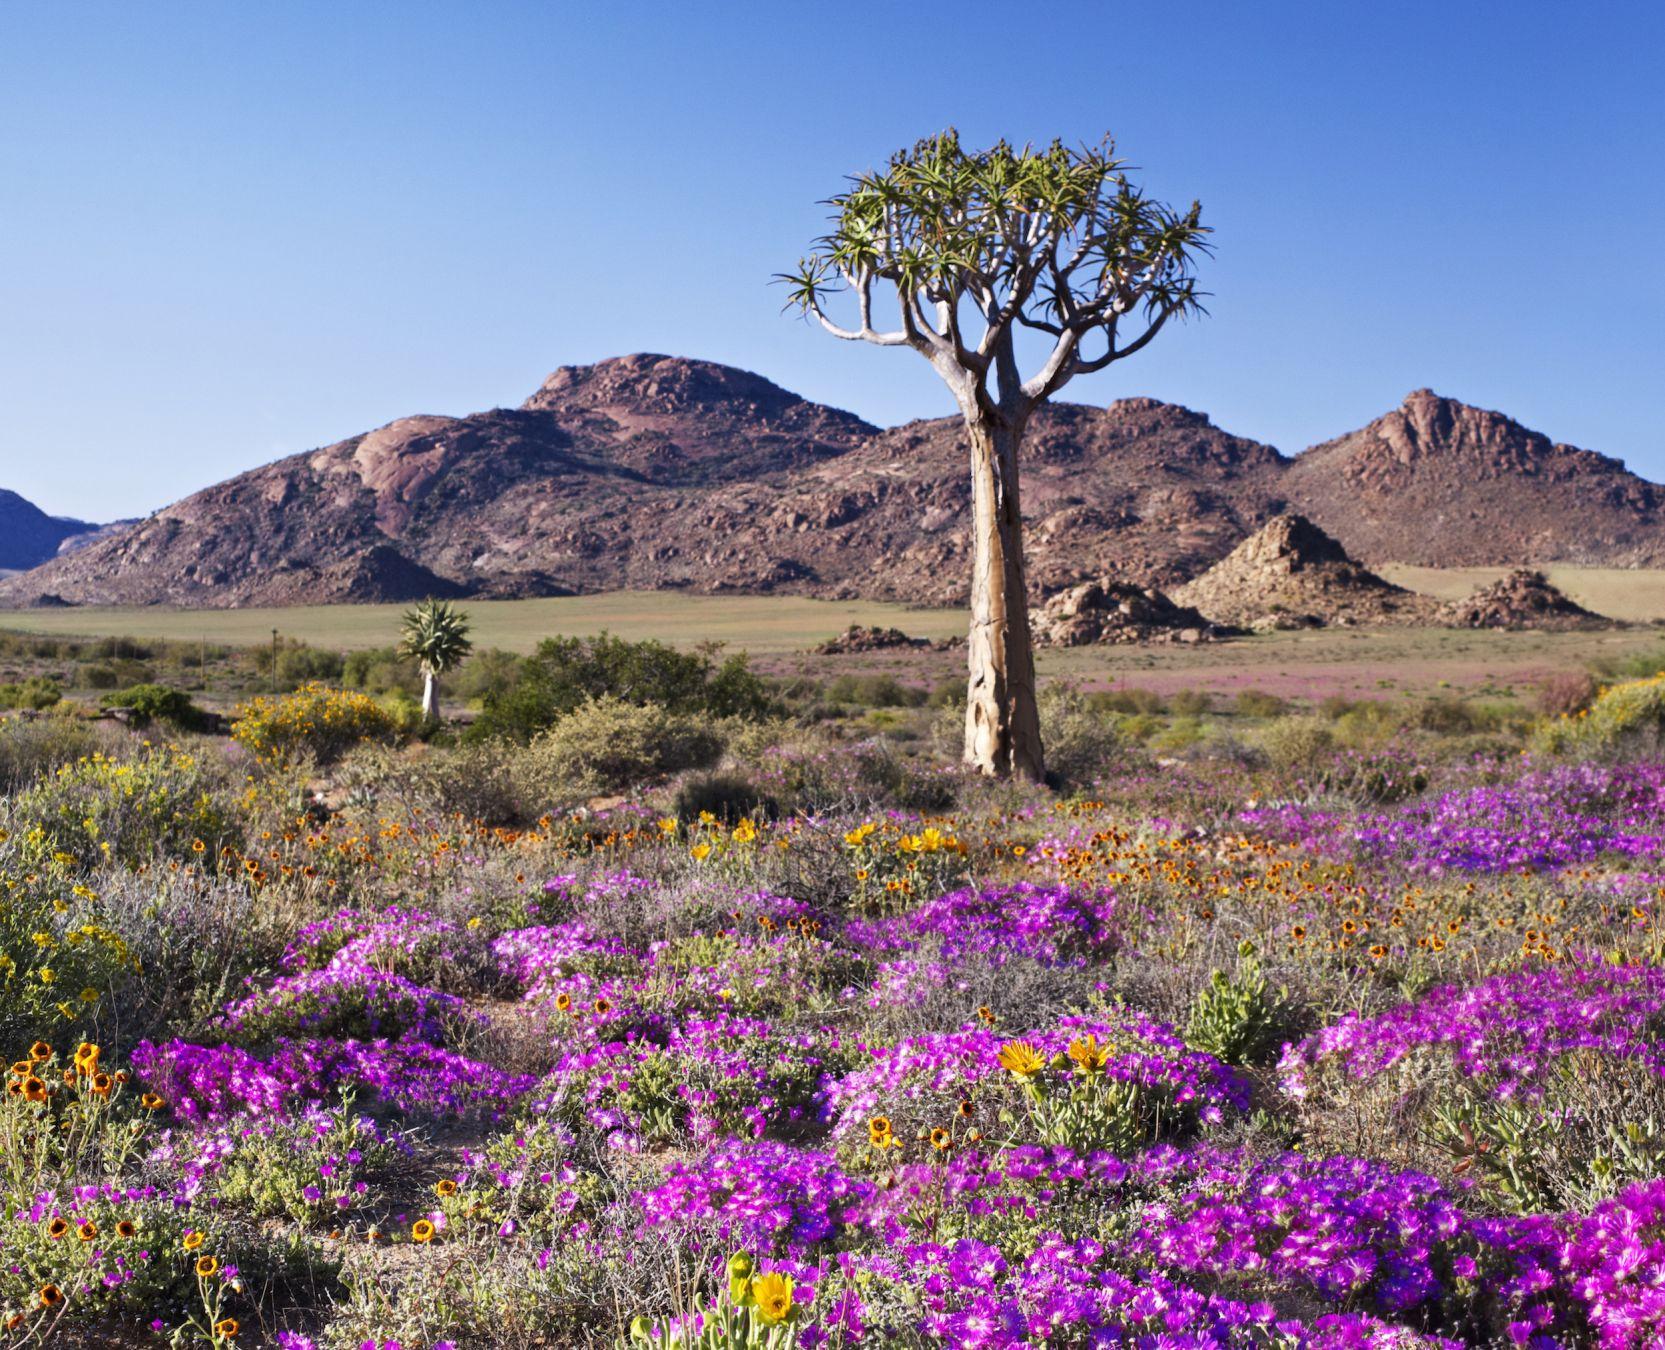 In Sudafrica per la spettacolare fioritura nel Namakwa